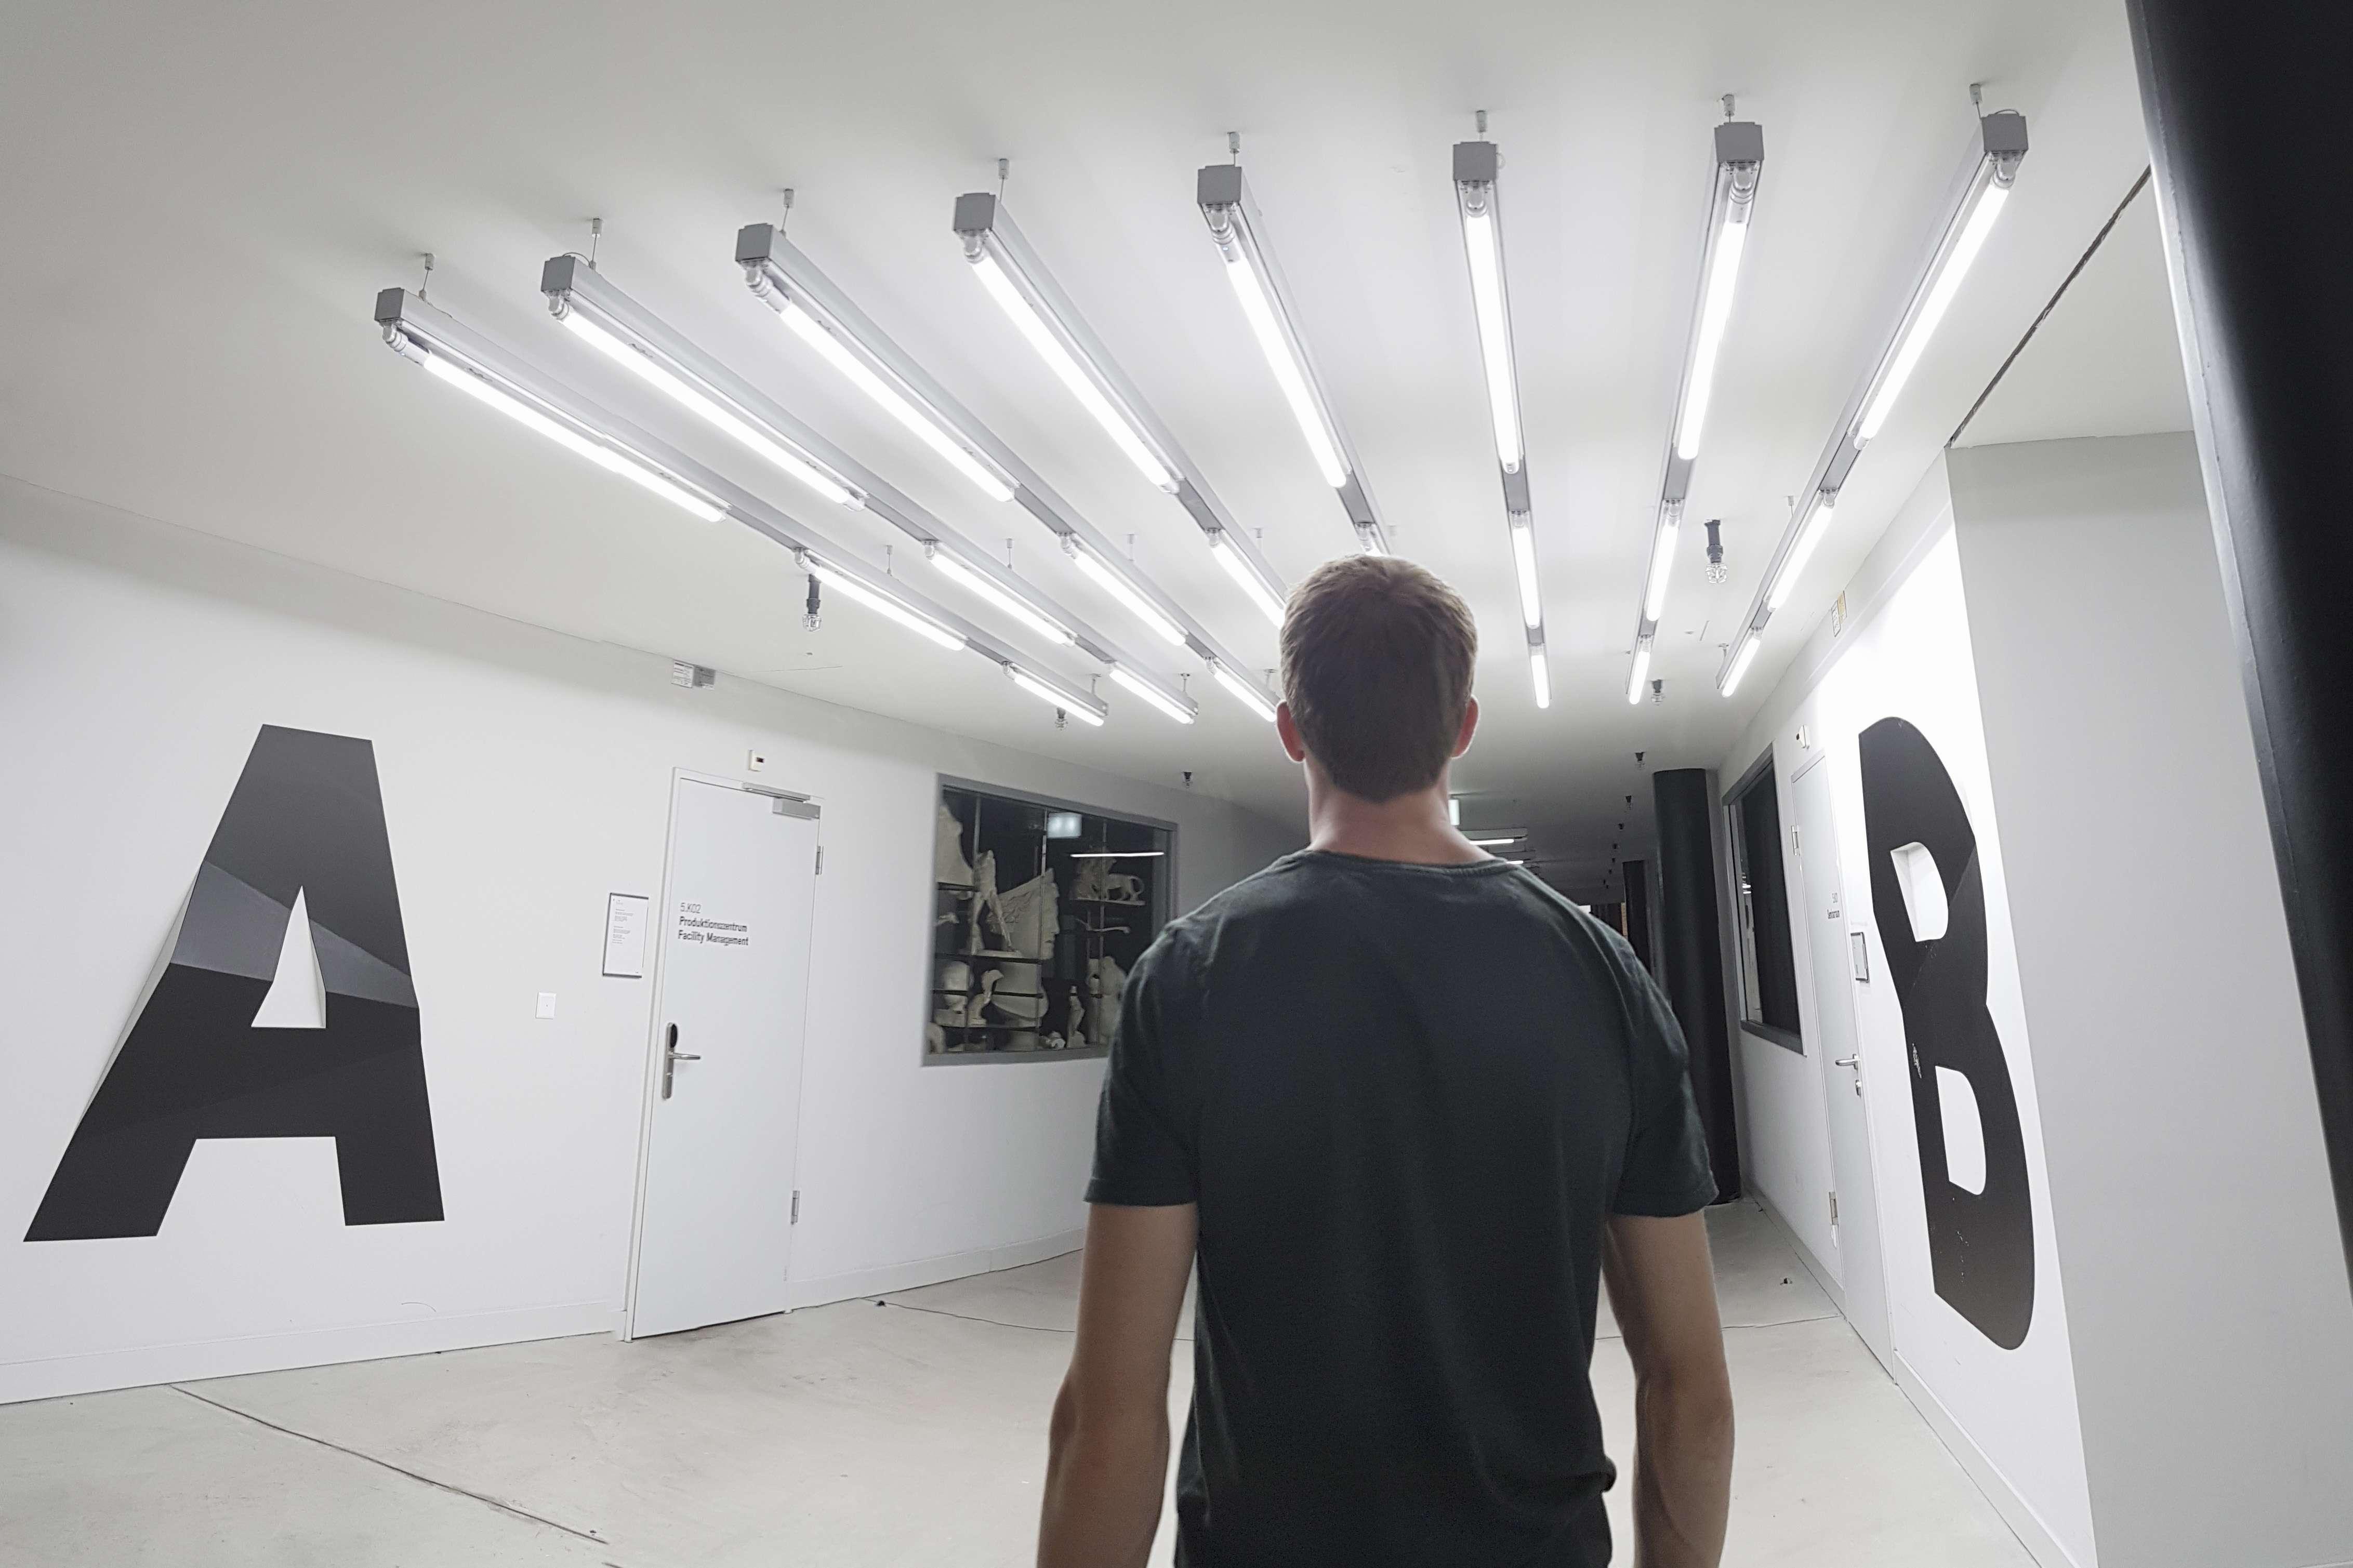 LEDCity-Beleuchtung in der ZHdK